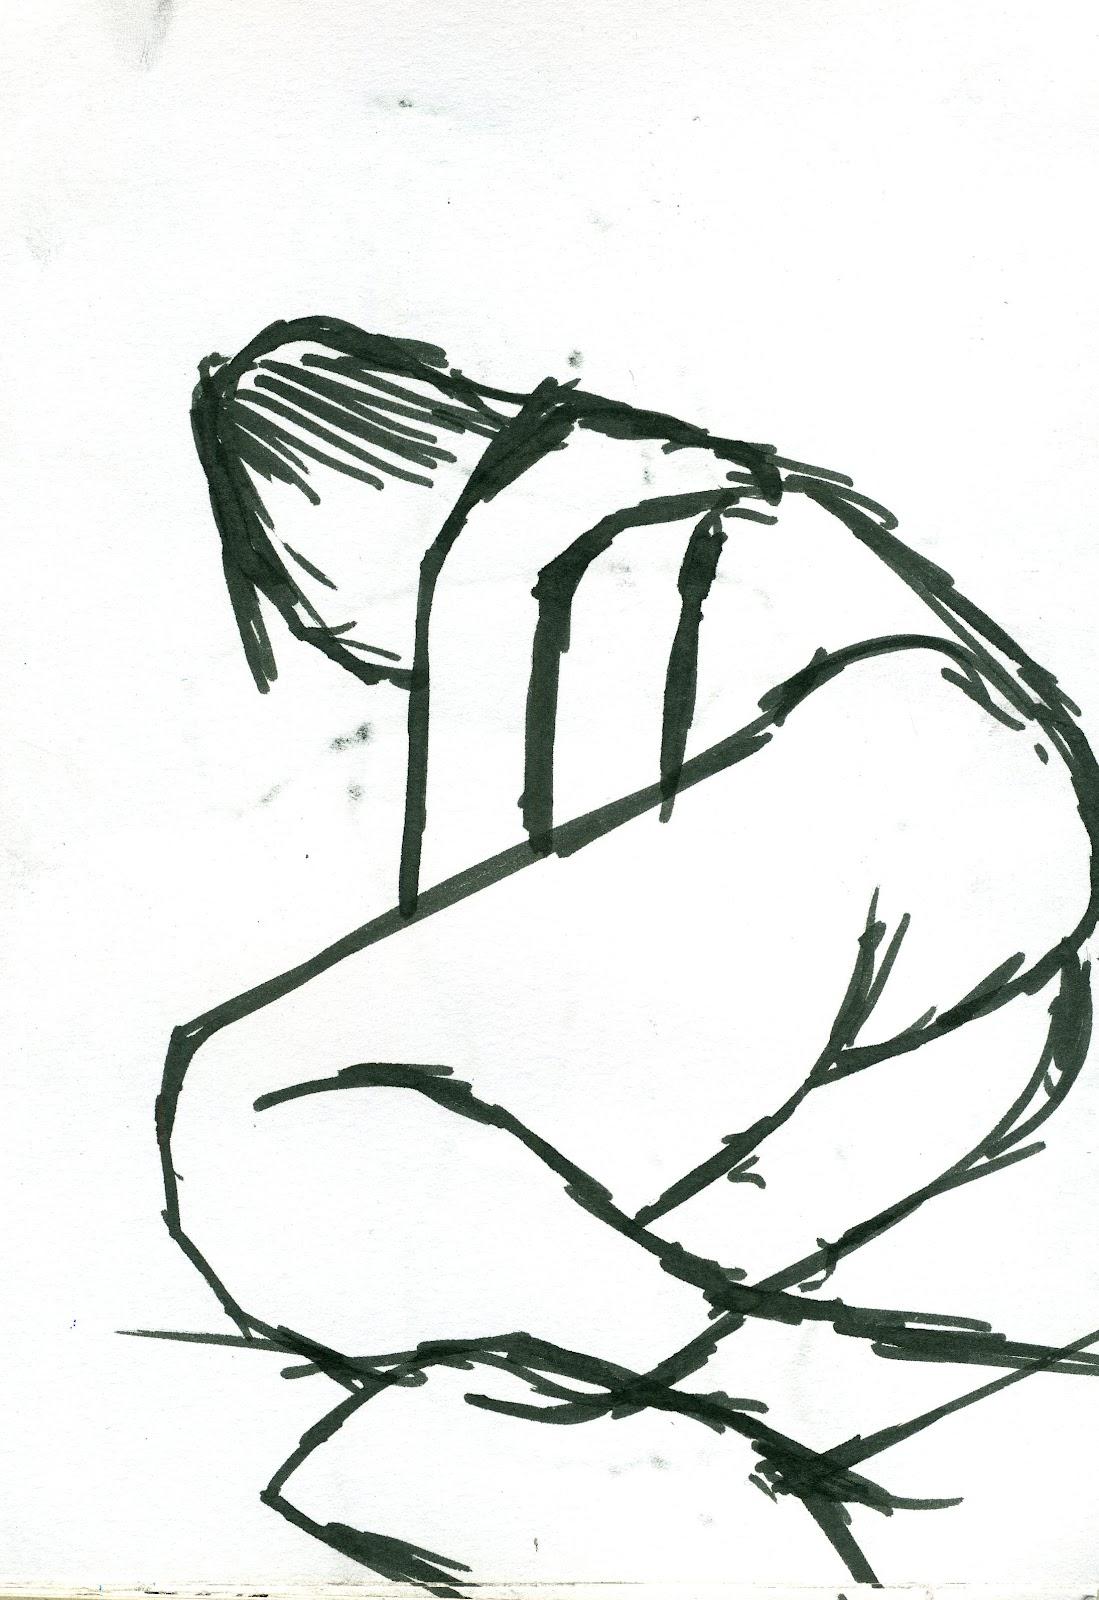 Human figure poses - photo#42